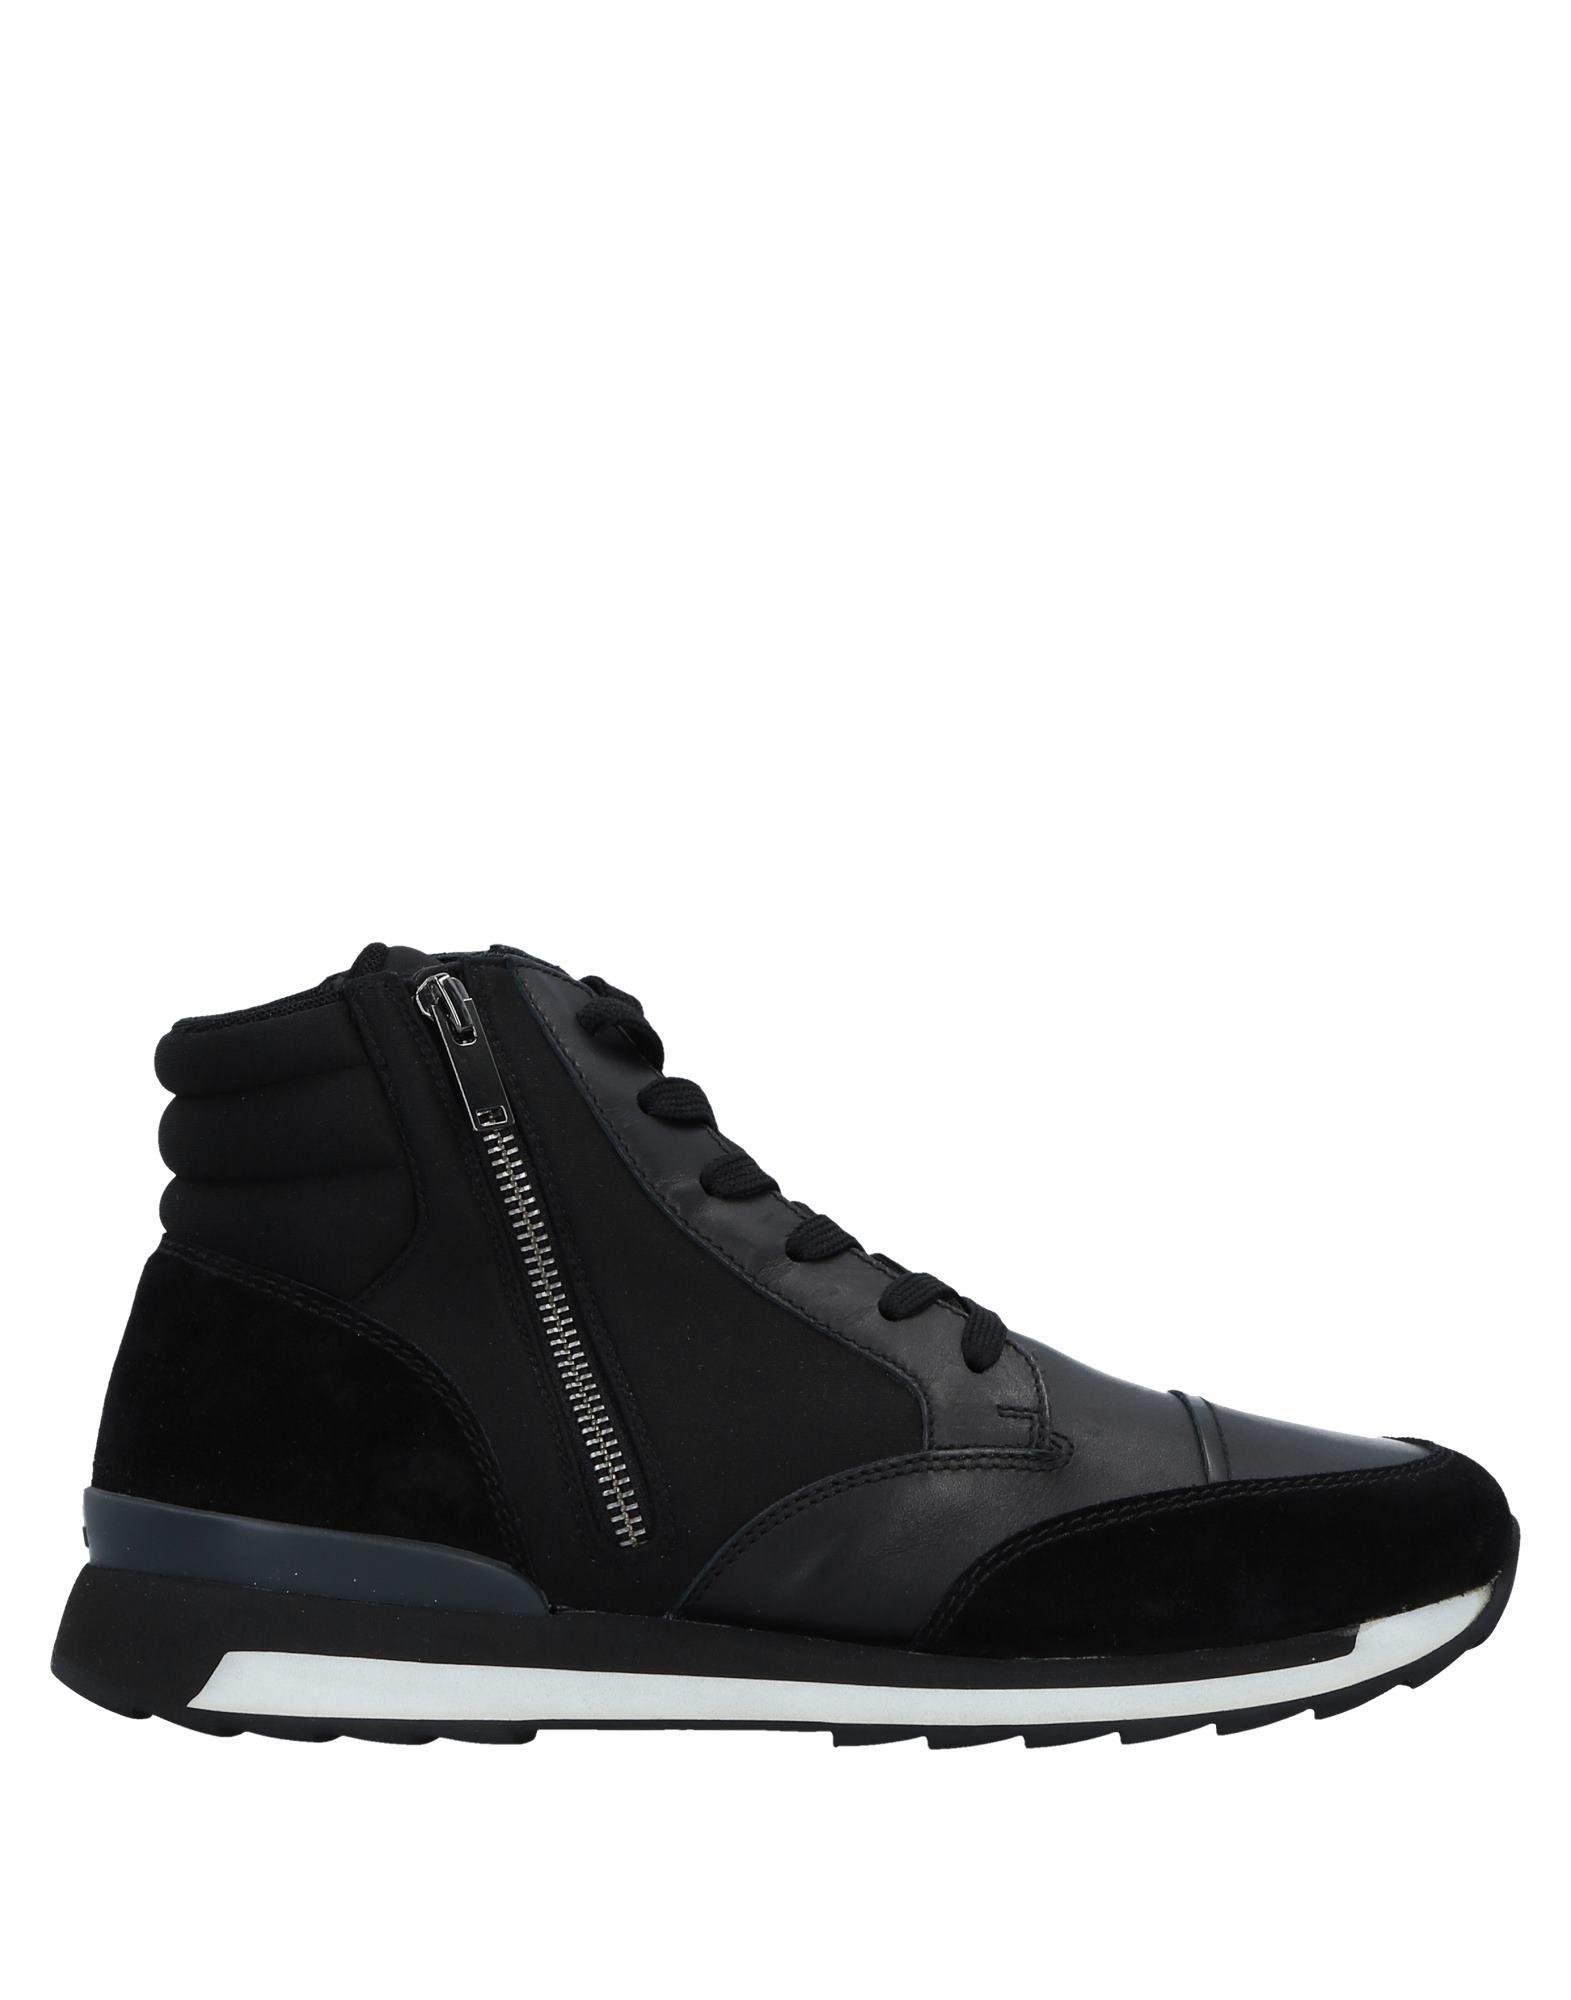 Hogan 11540673BB Rebel Sneakers Herren  11540673BB Hogan 6b14c9